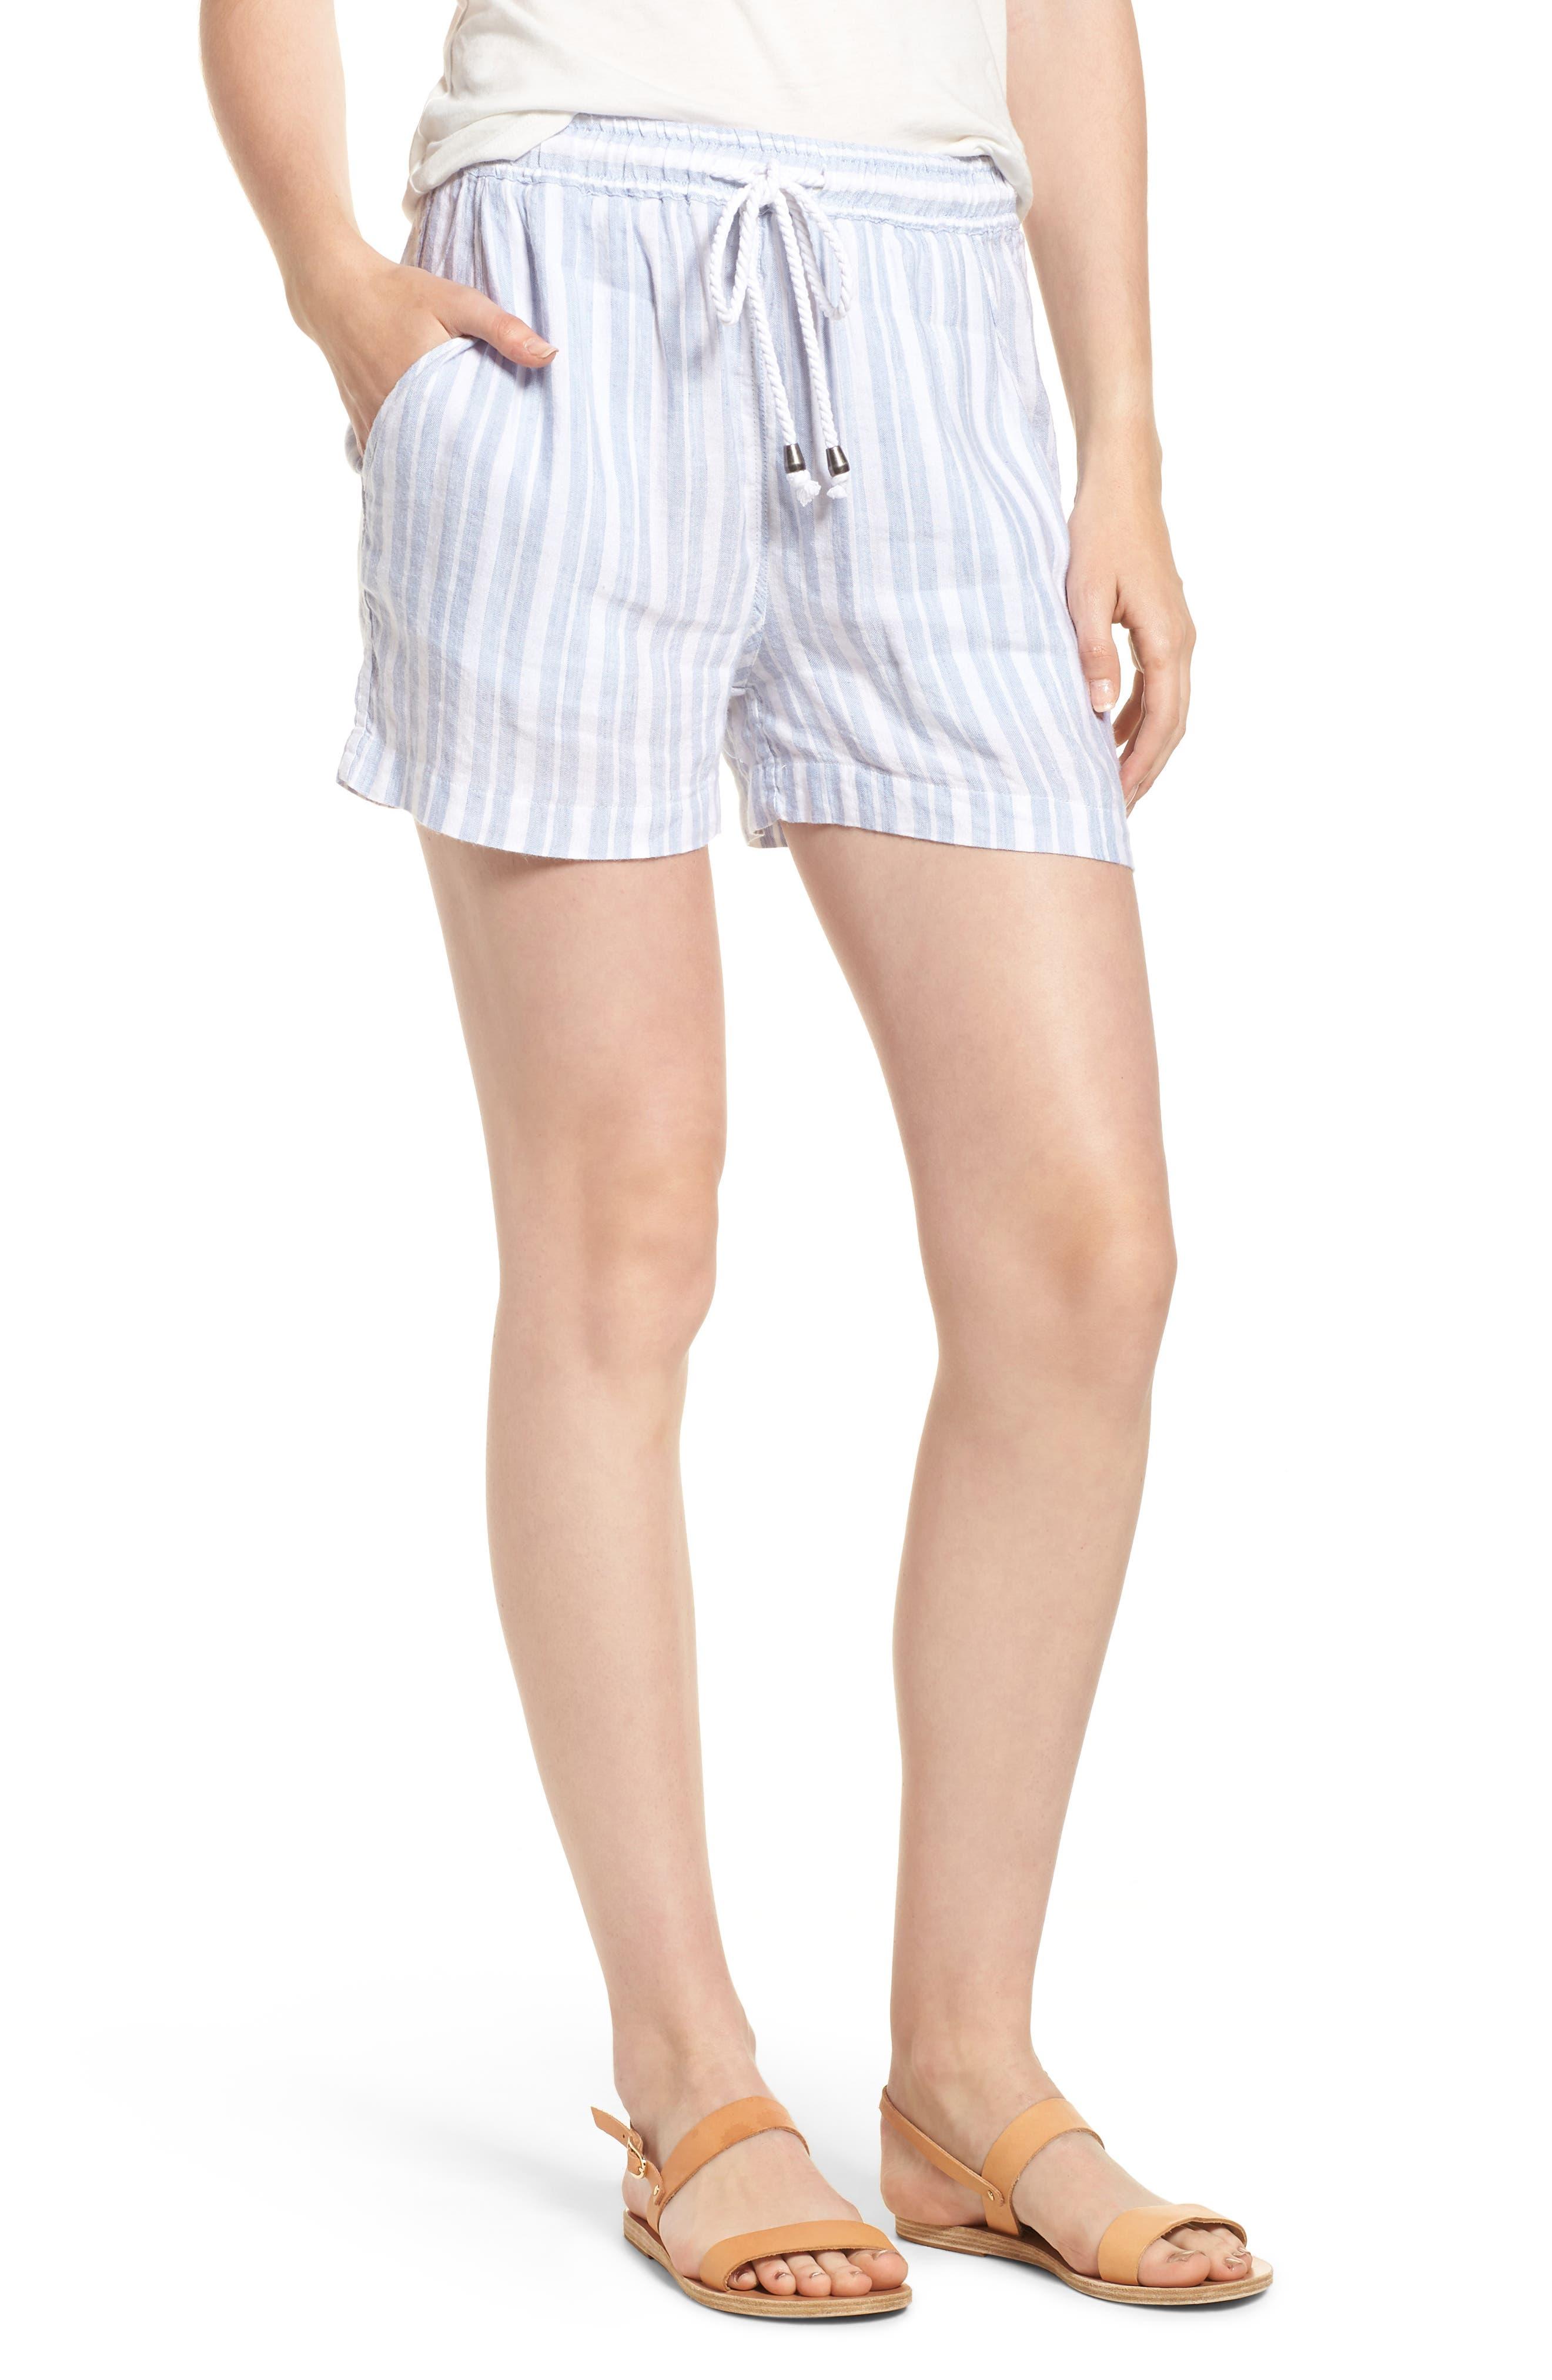 Brea Shorts,                         Main,                         color, HOLLAND STRIPE